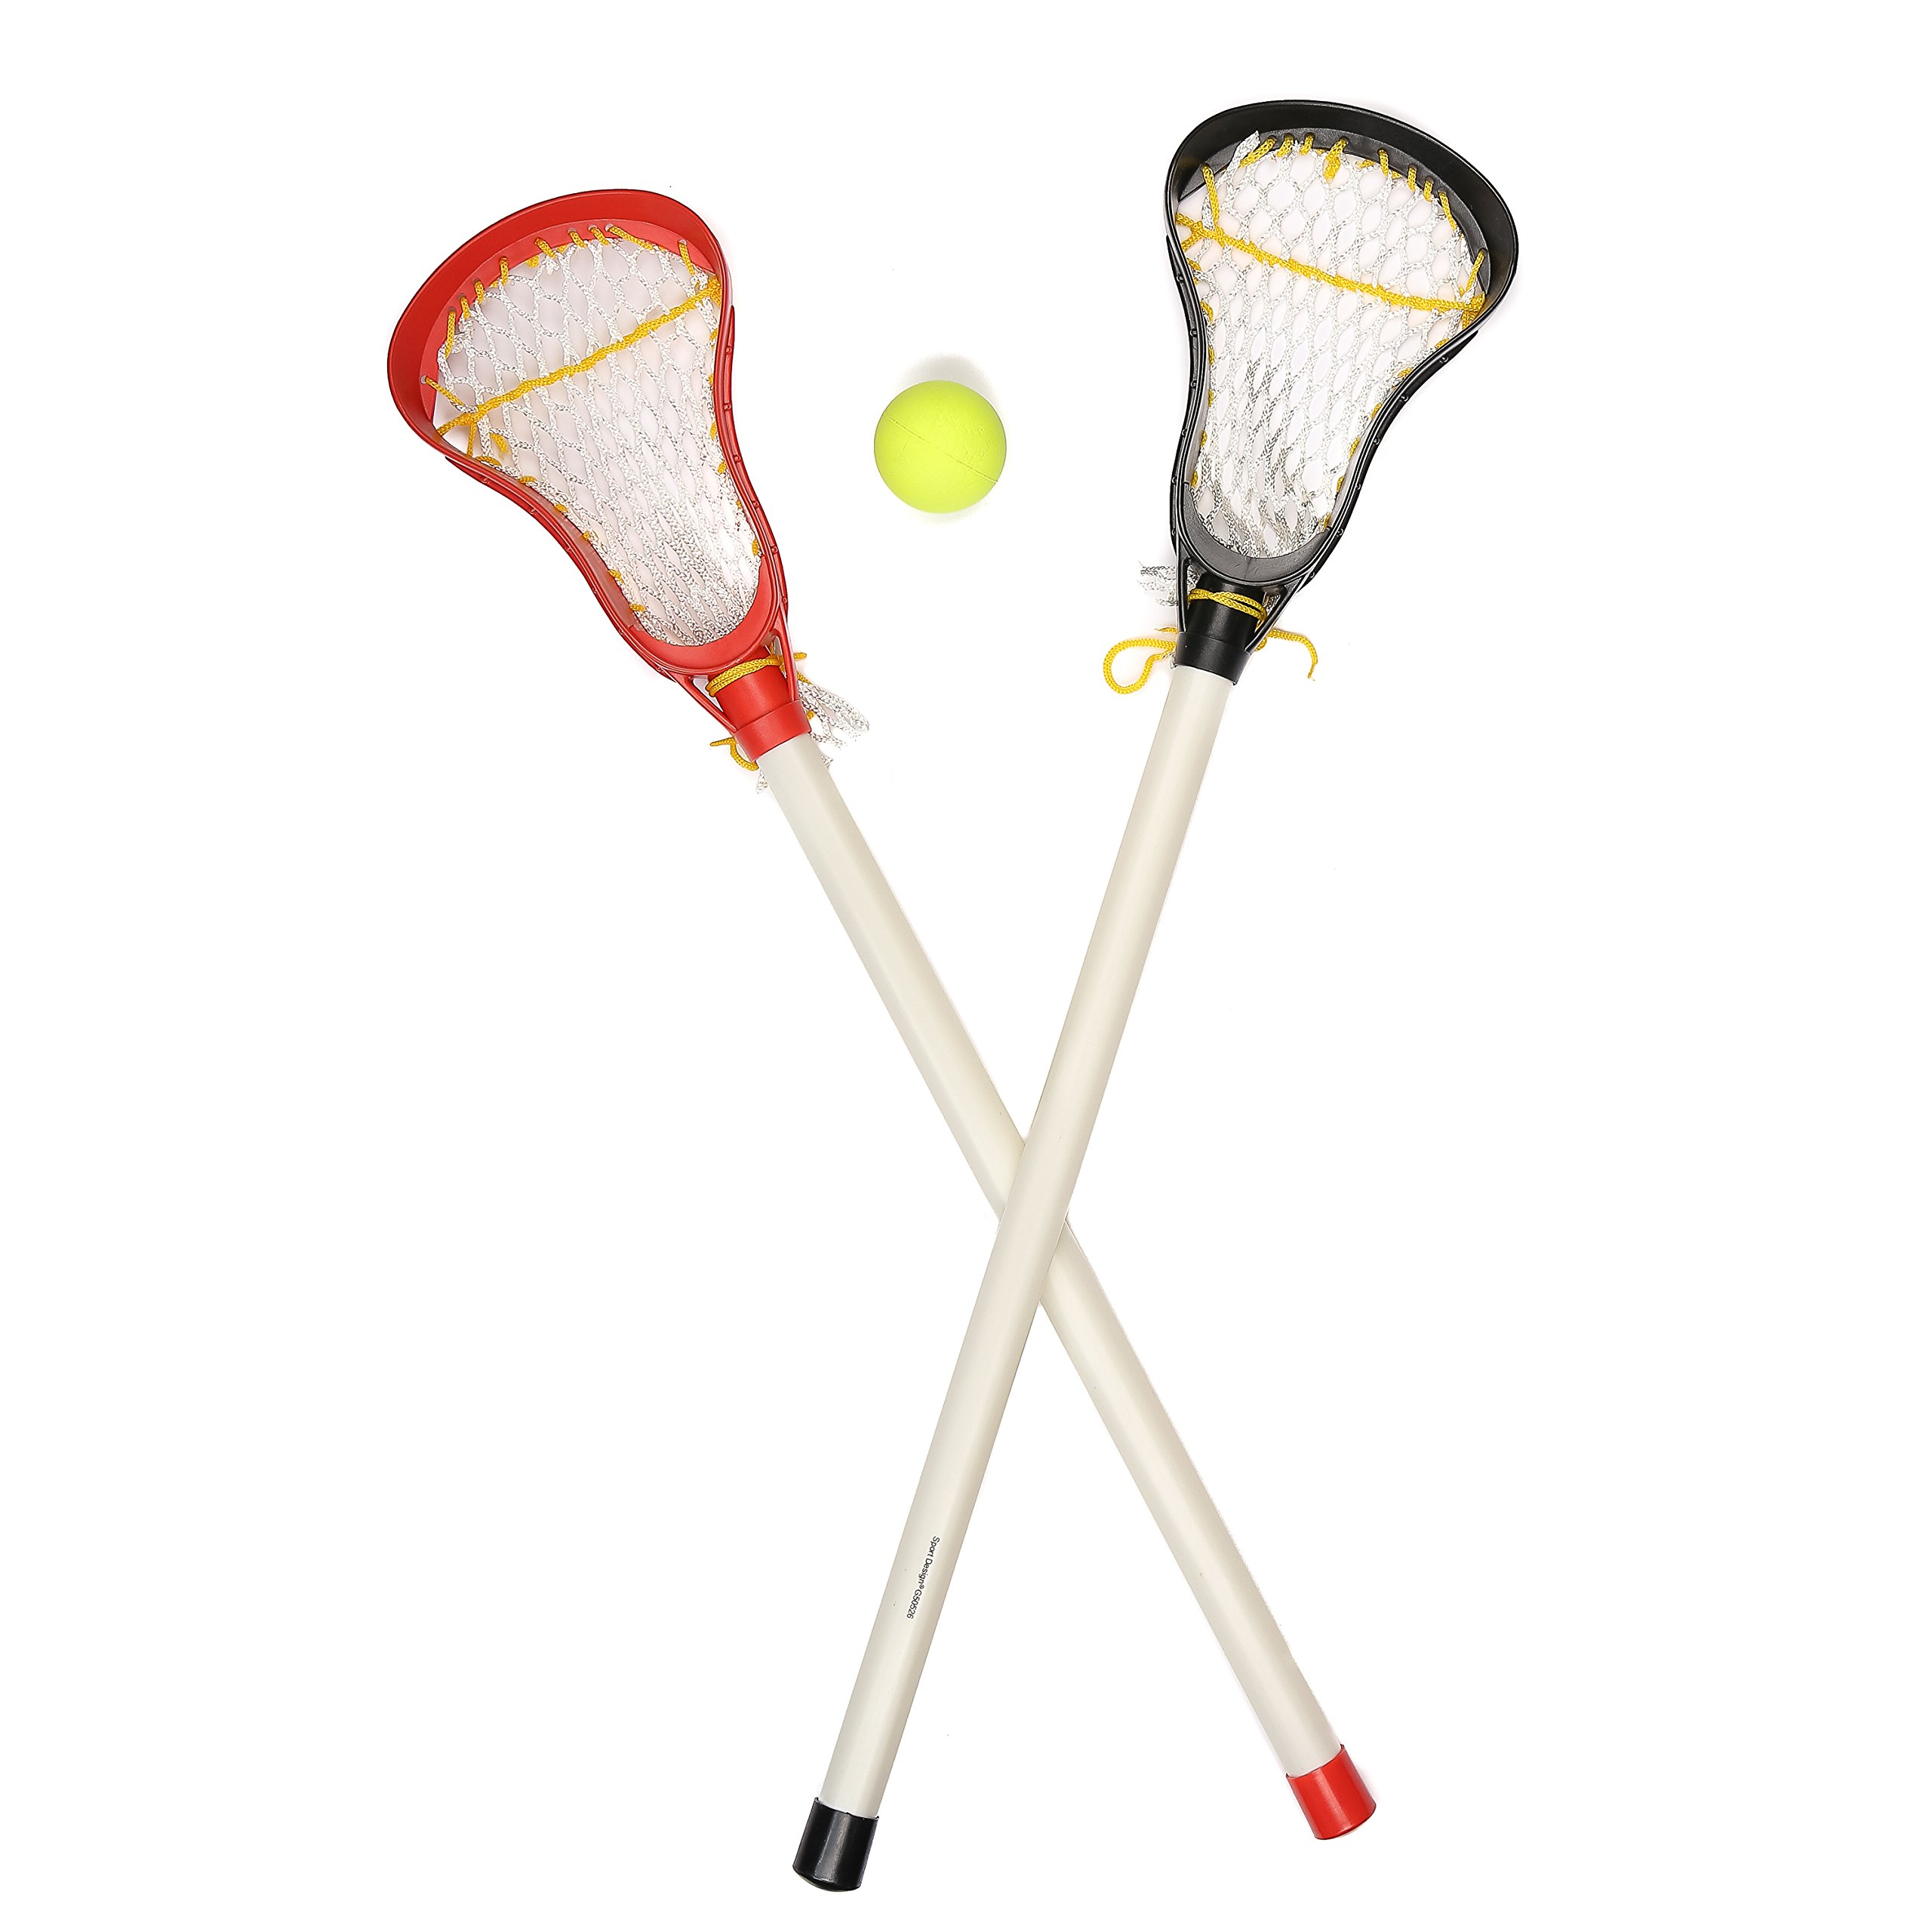 Kids Lacrosse Sticks - 2 Sticks (30 Inches) & 1 Ball - Soft Mesh Pockets, Durable Plastic Handles, & Large Head Design by Junior Lacrosse (Image #1)